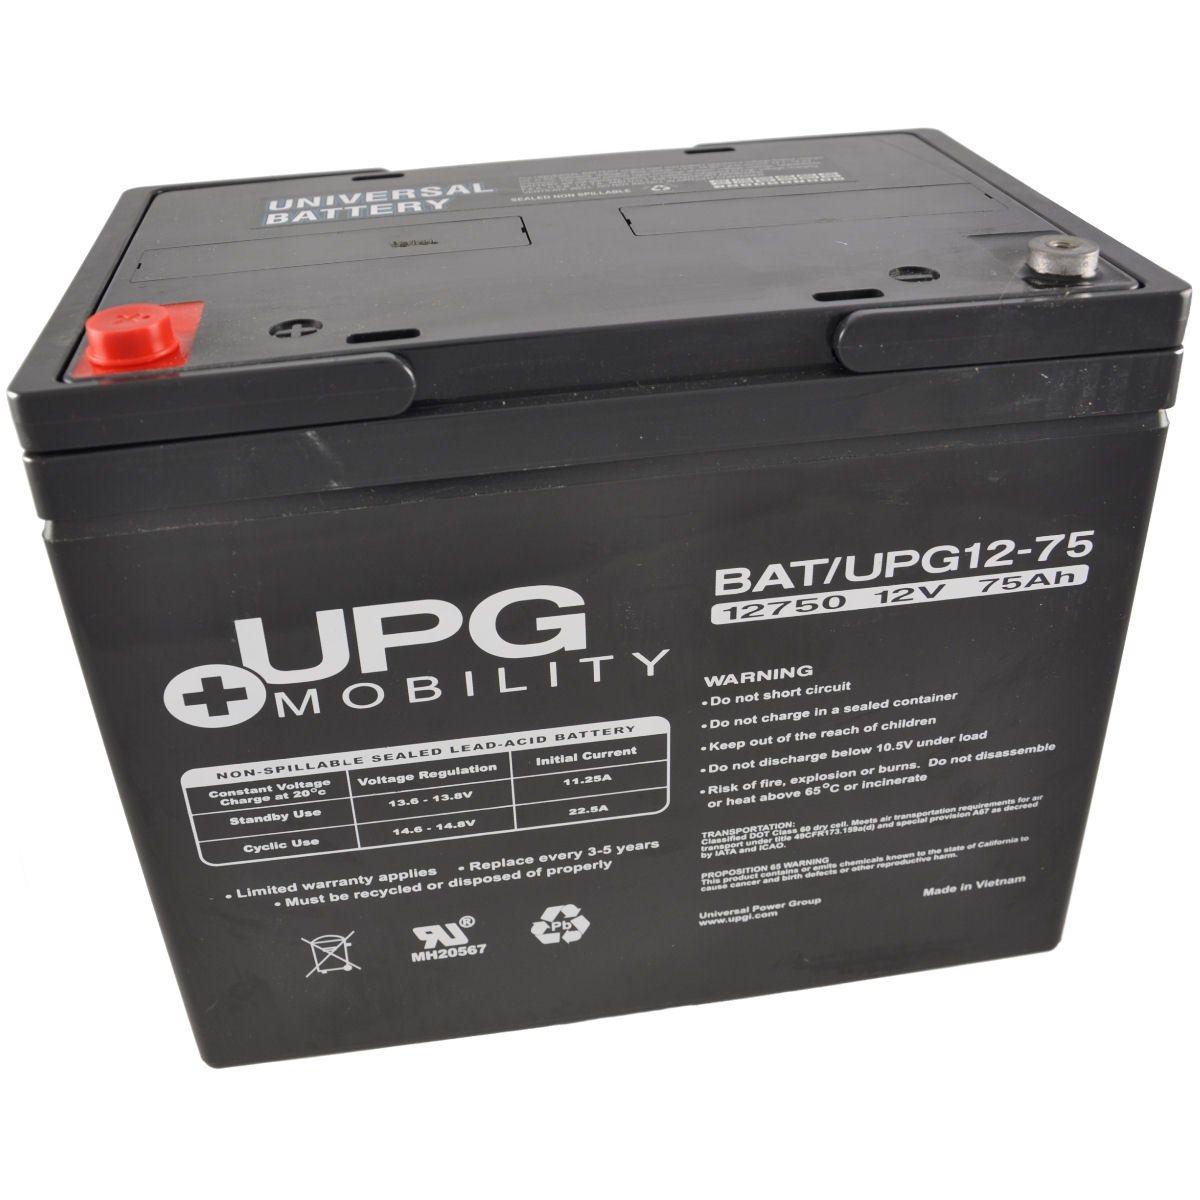 12V 75Ah UPG Sealed Lead Acid (AGM) Mobility Scooter Battery